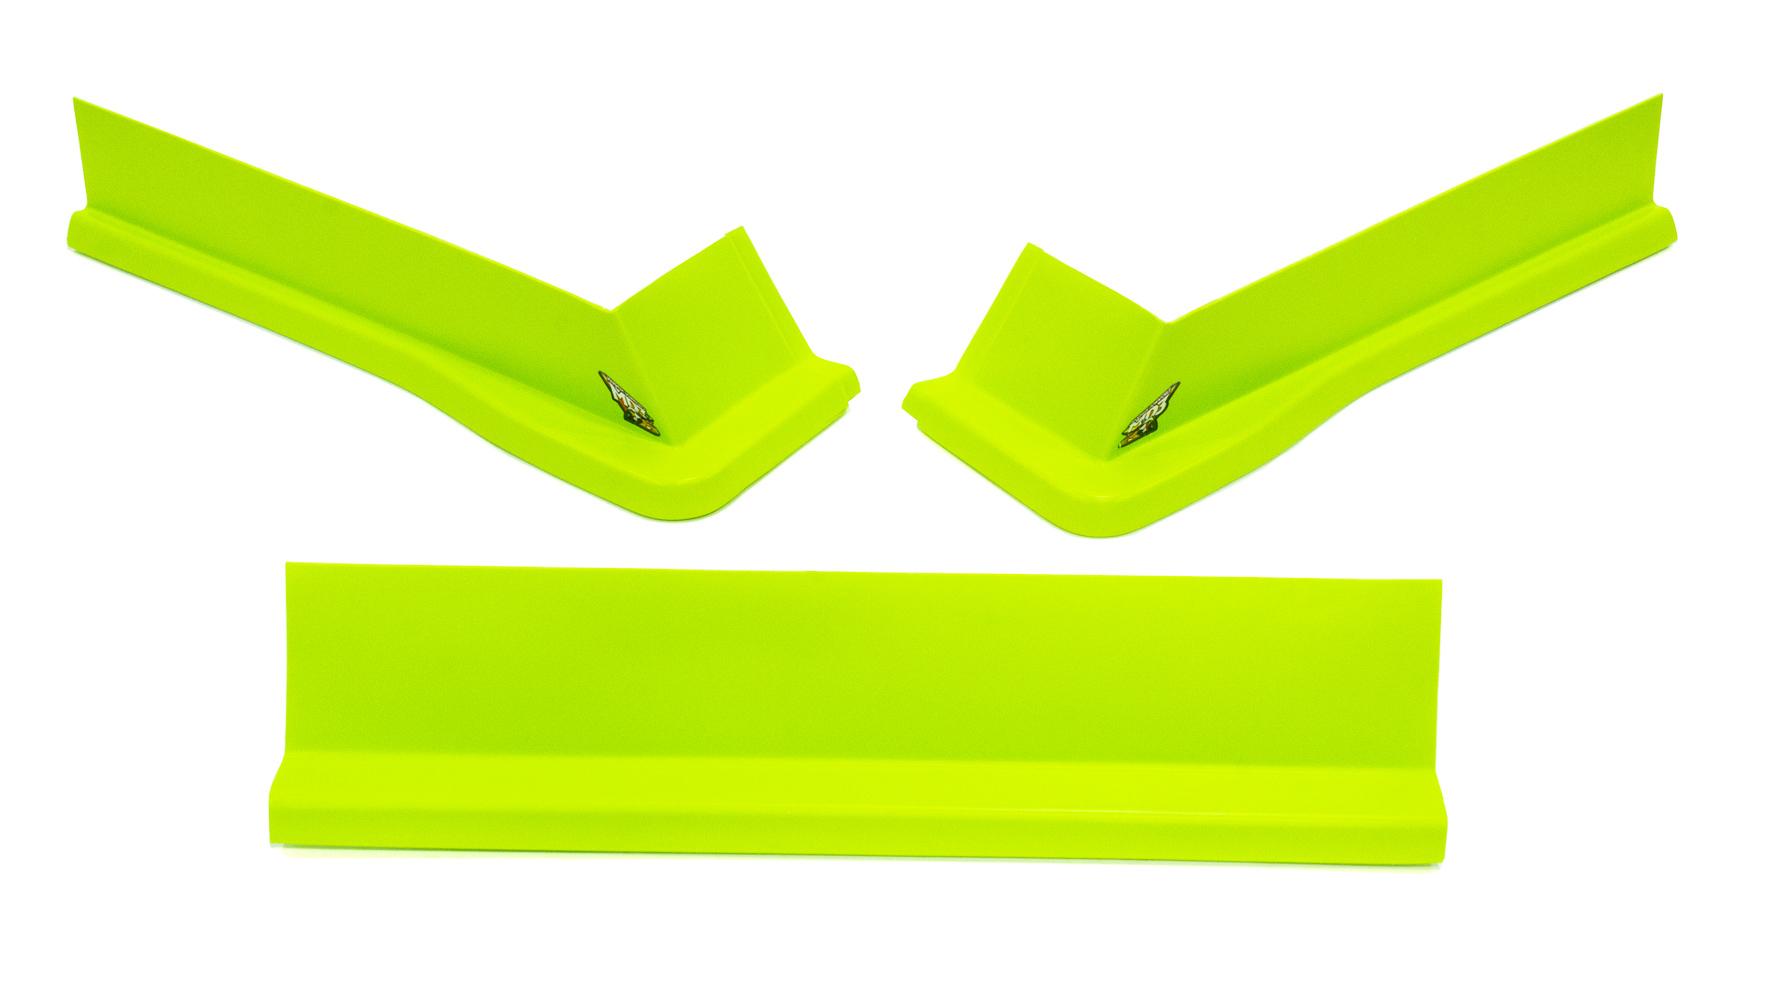 Fivestar Modified Aero Valance 3pc. Fluorescent Green